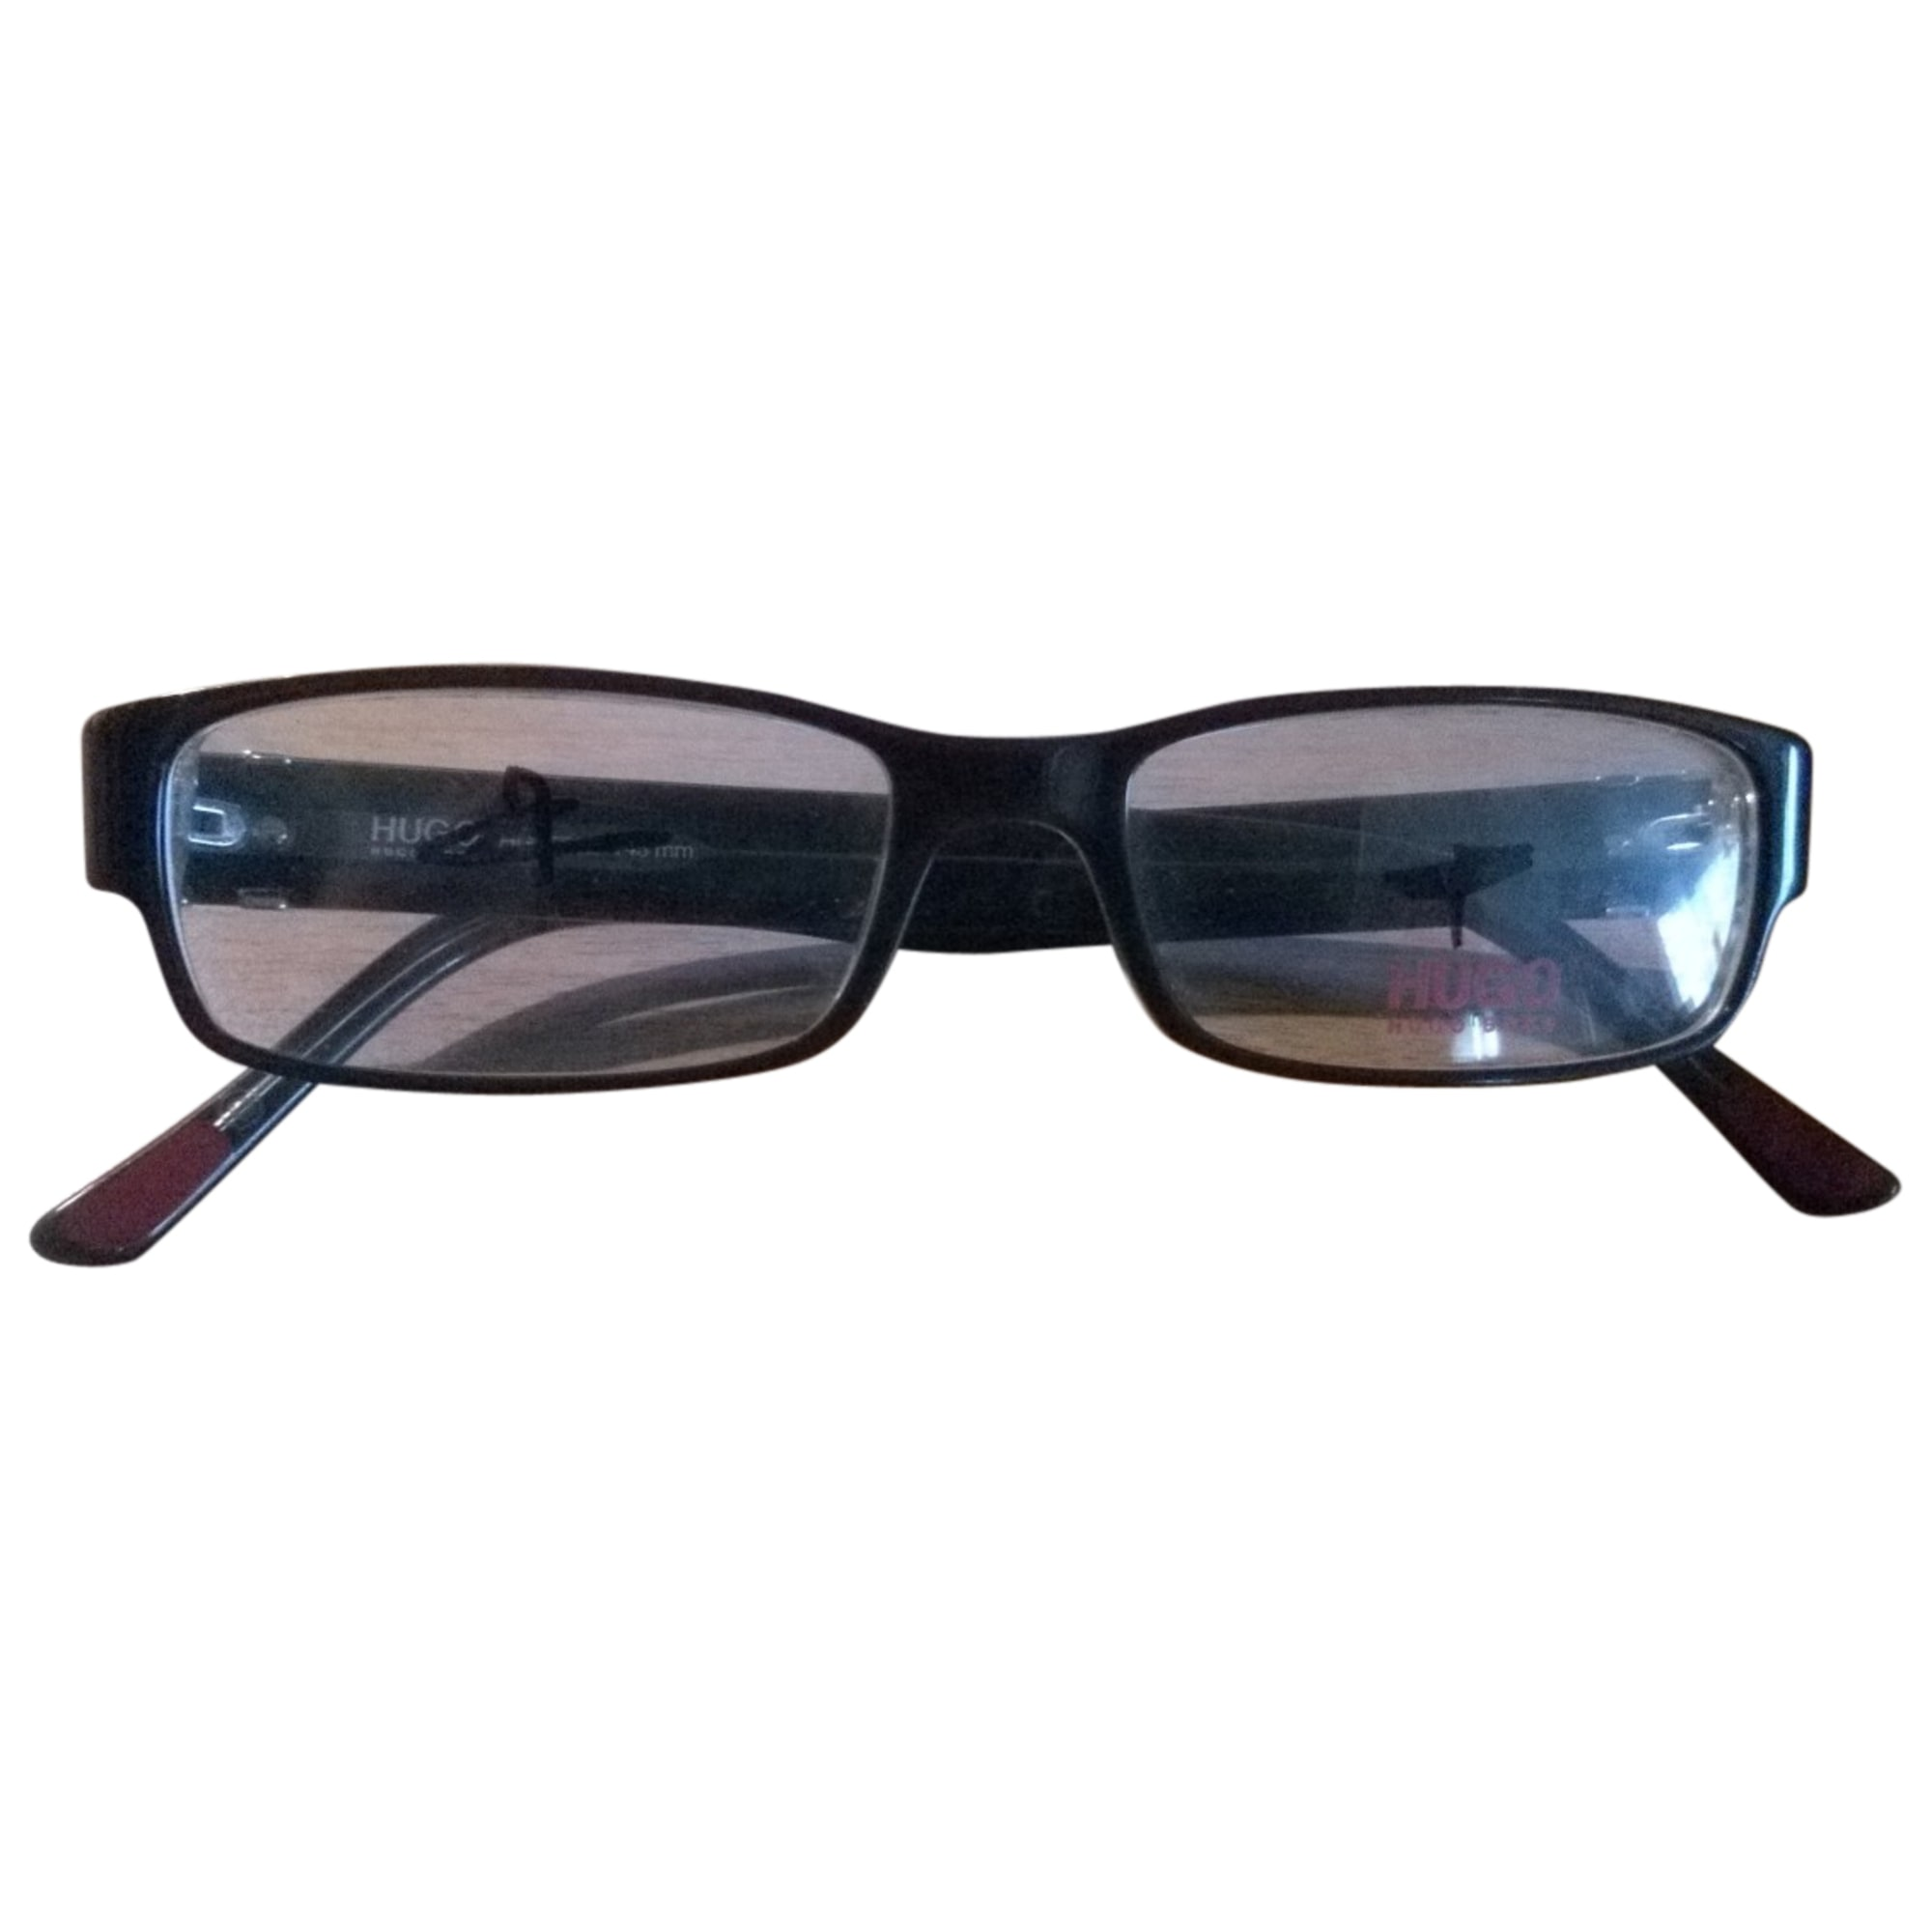 069b4470e9371 Monture de lunettes HUGO BOSS noir - 3742823